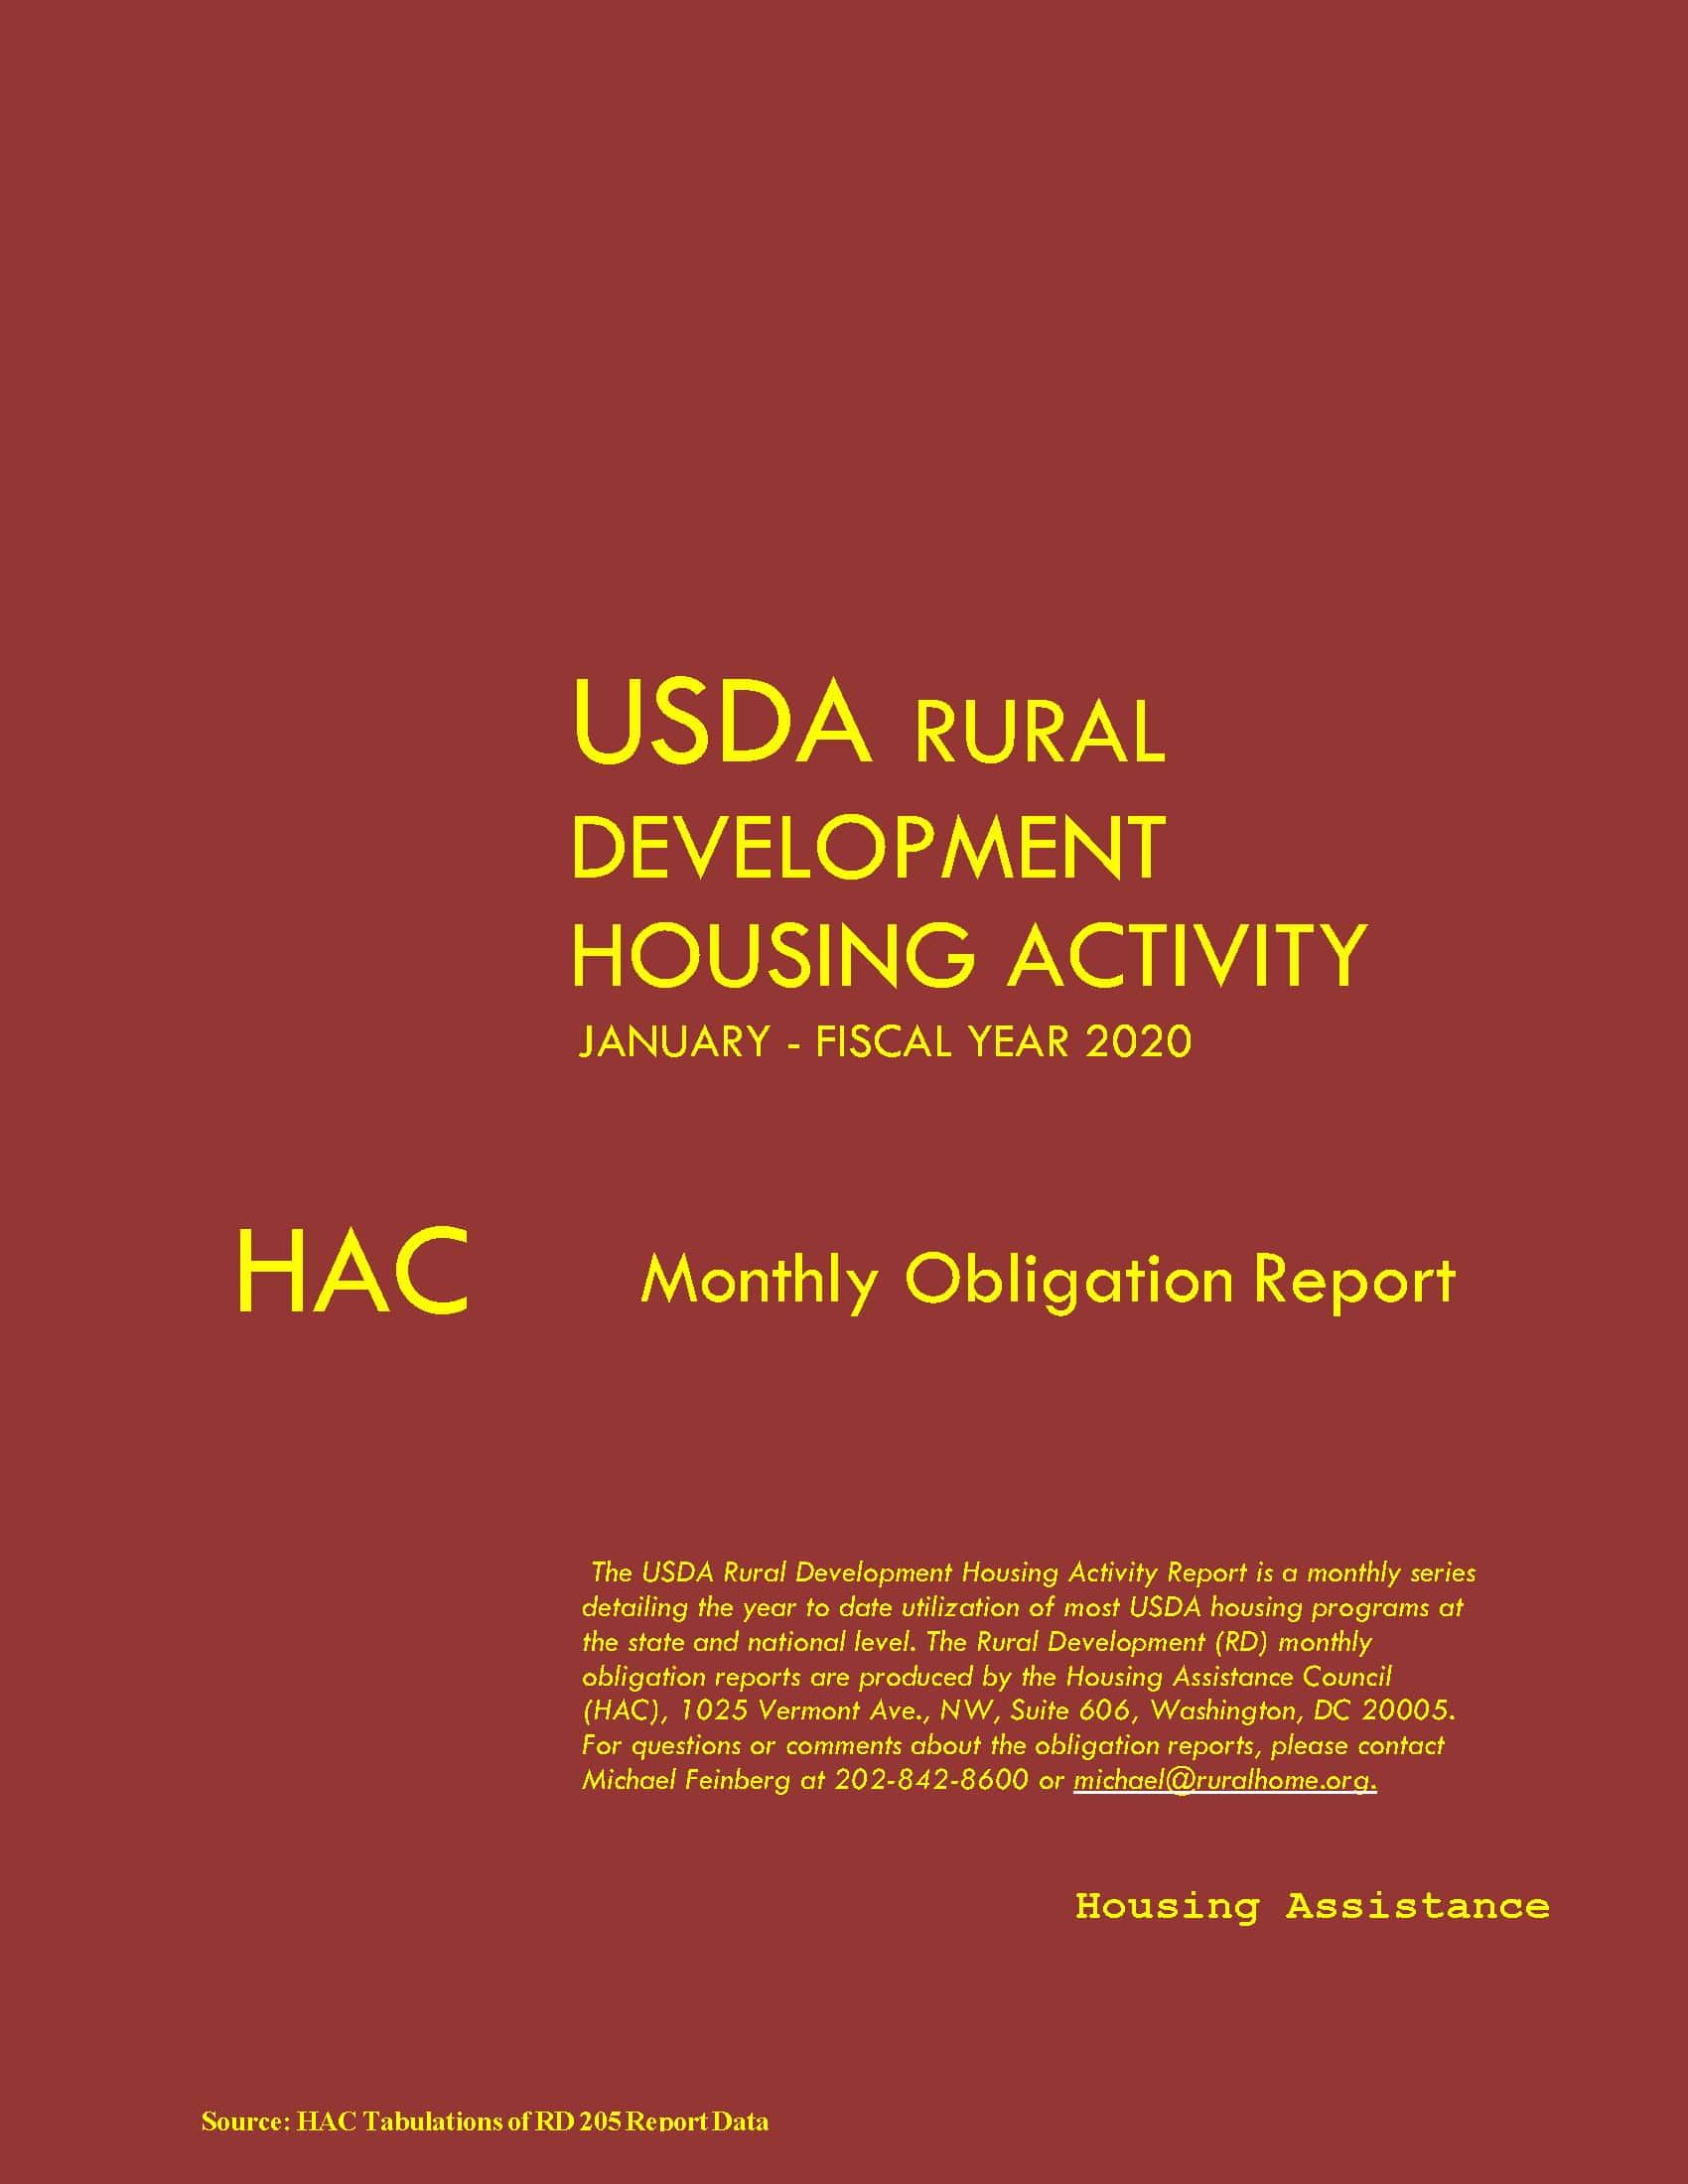 Rural Development Recent Obligations Report